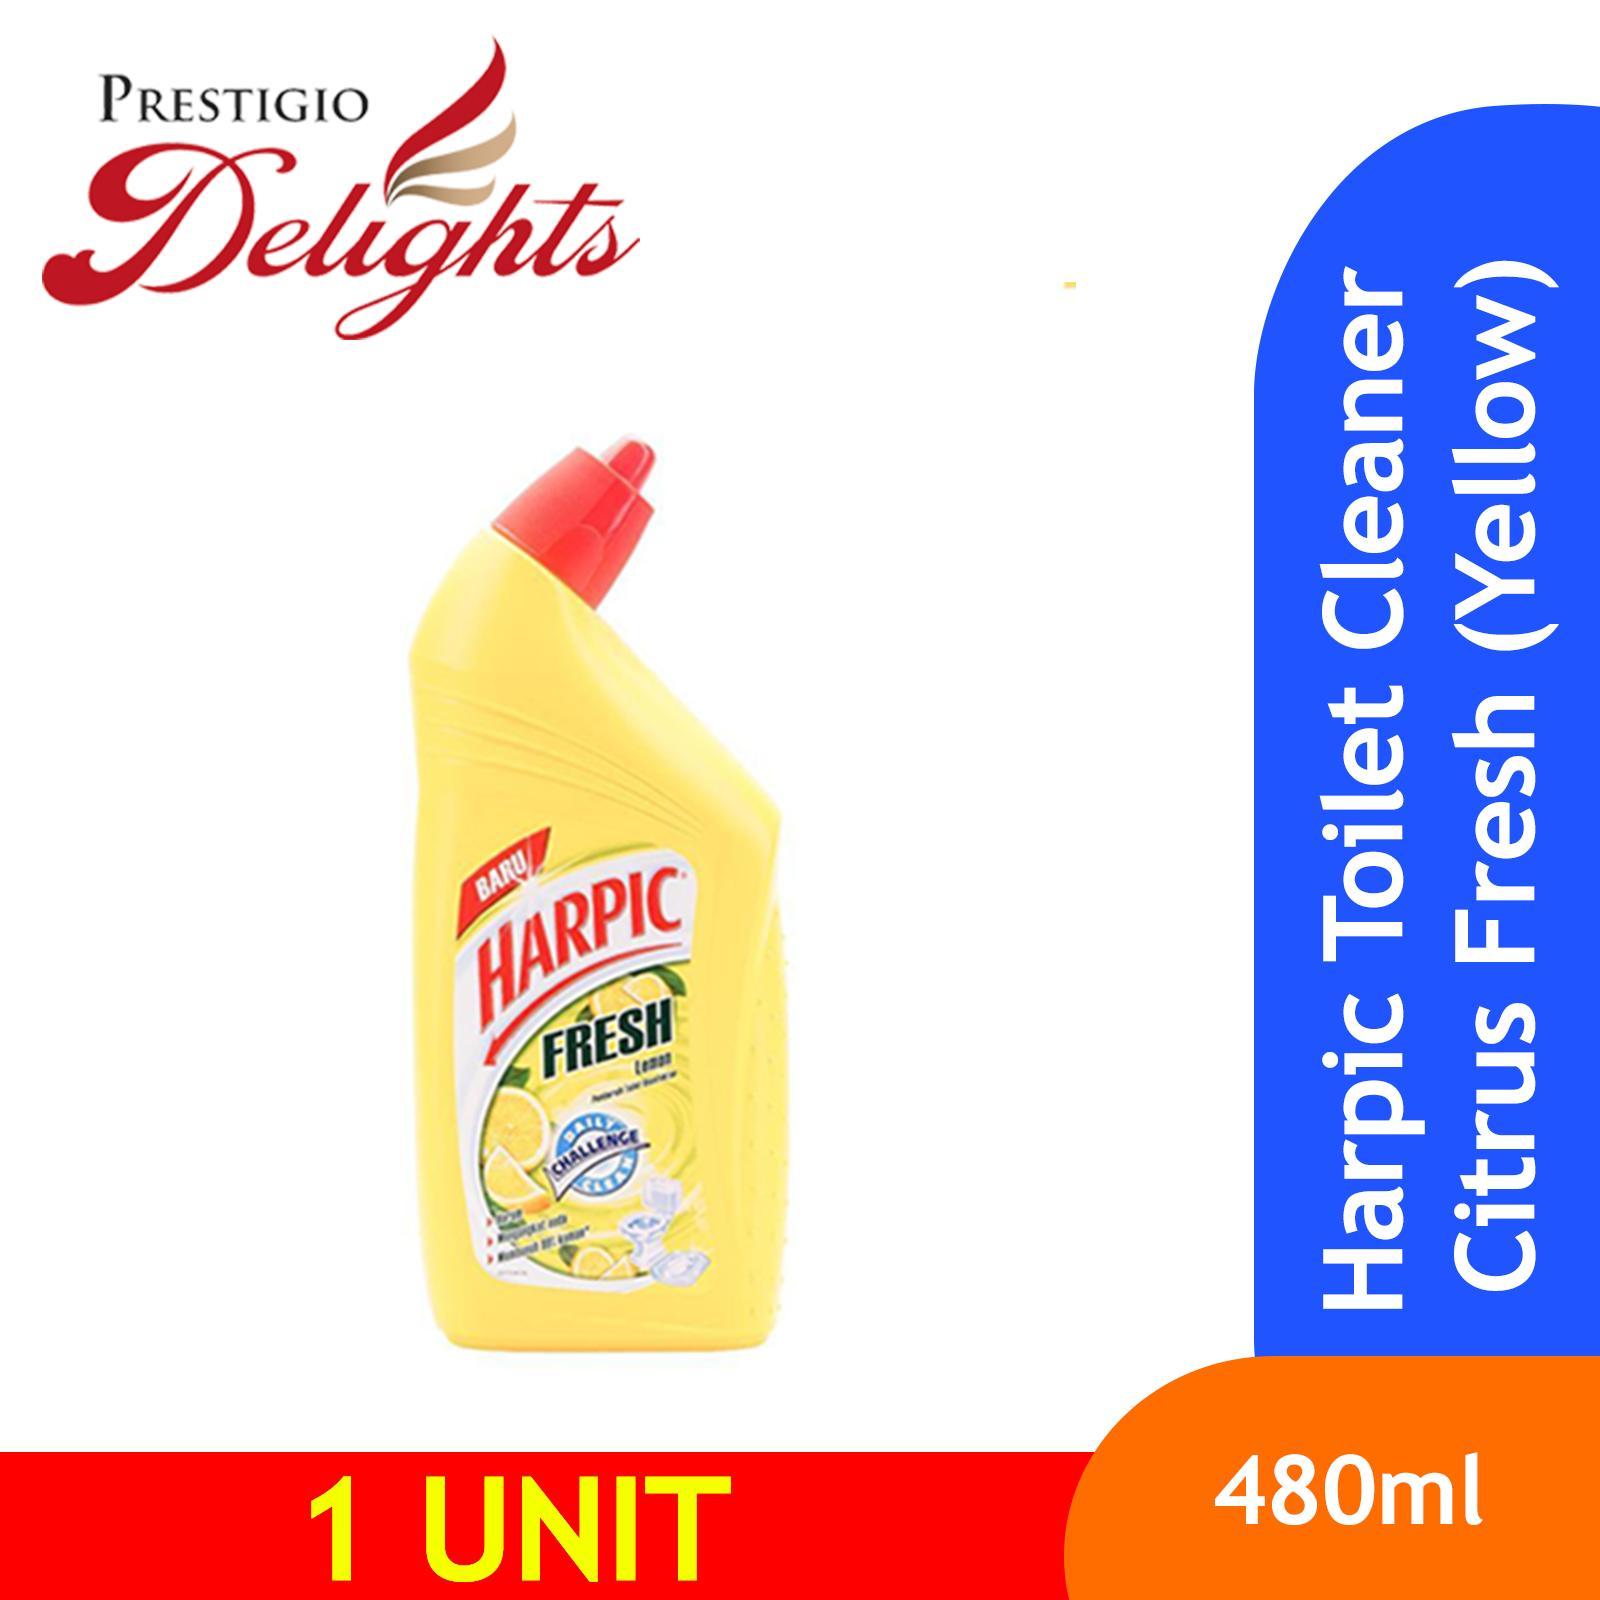 Harpic Toilet Cleaner Citrus Fresh Lemon (yellow) 450ml By Prestigio Delights.